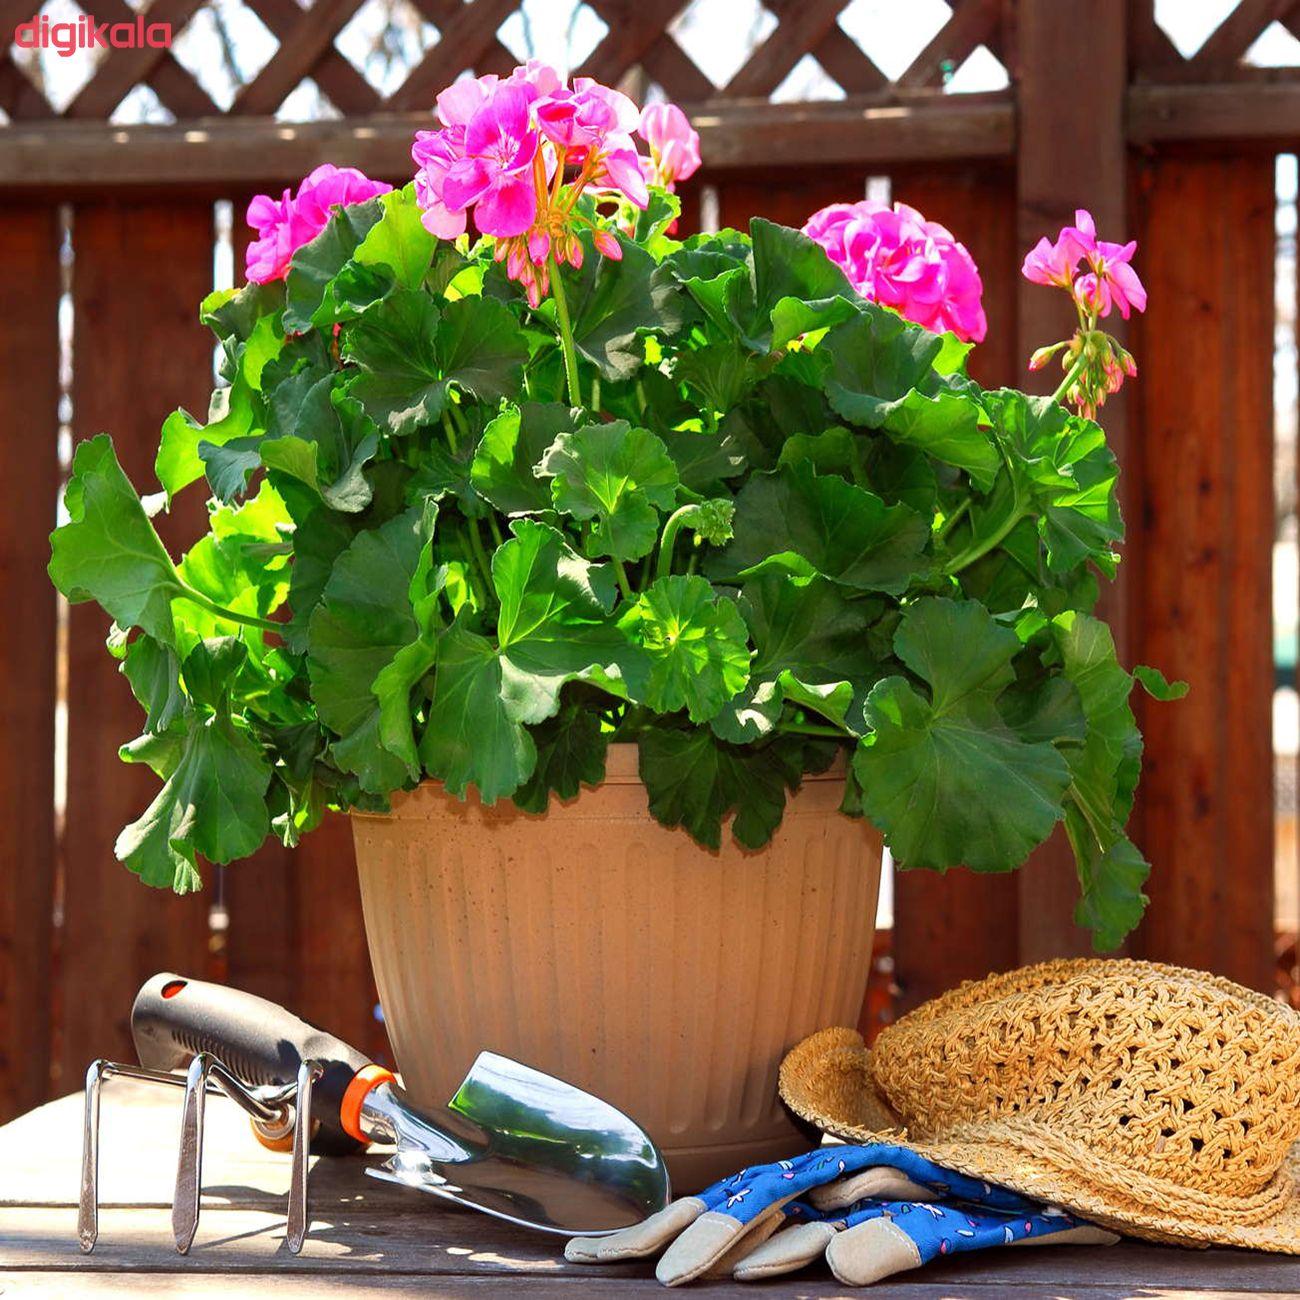 بذر گل شمعدانی پاکوتاه الوان وانیا سید مدل N76 main 1 5